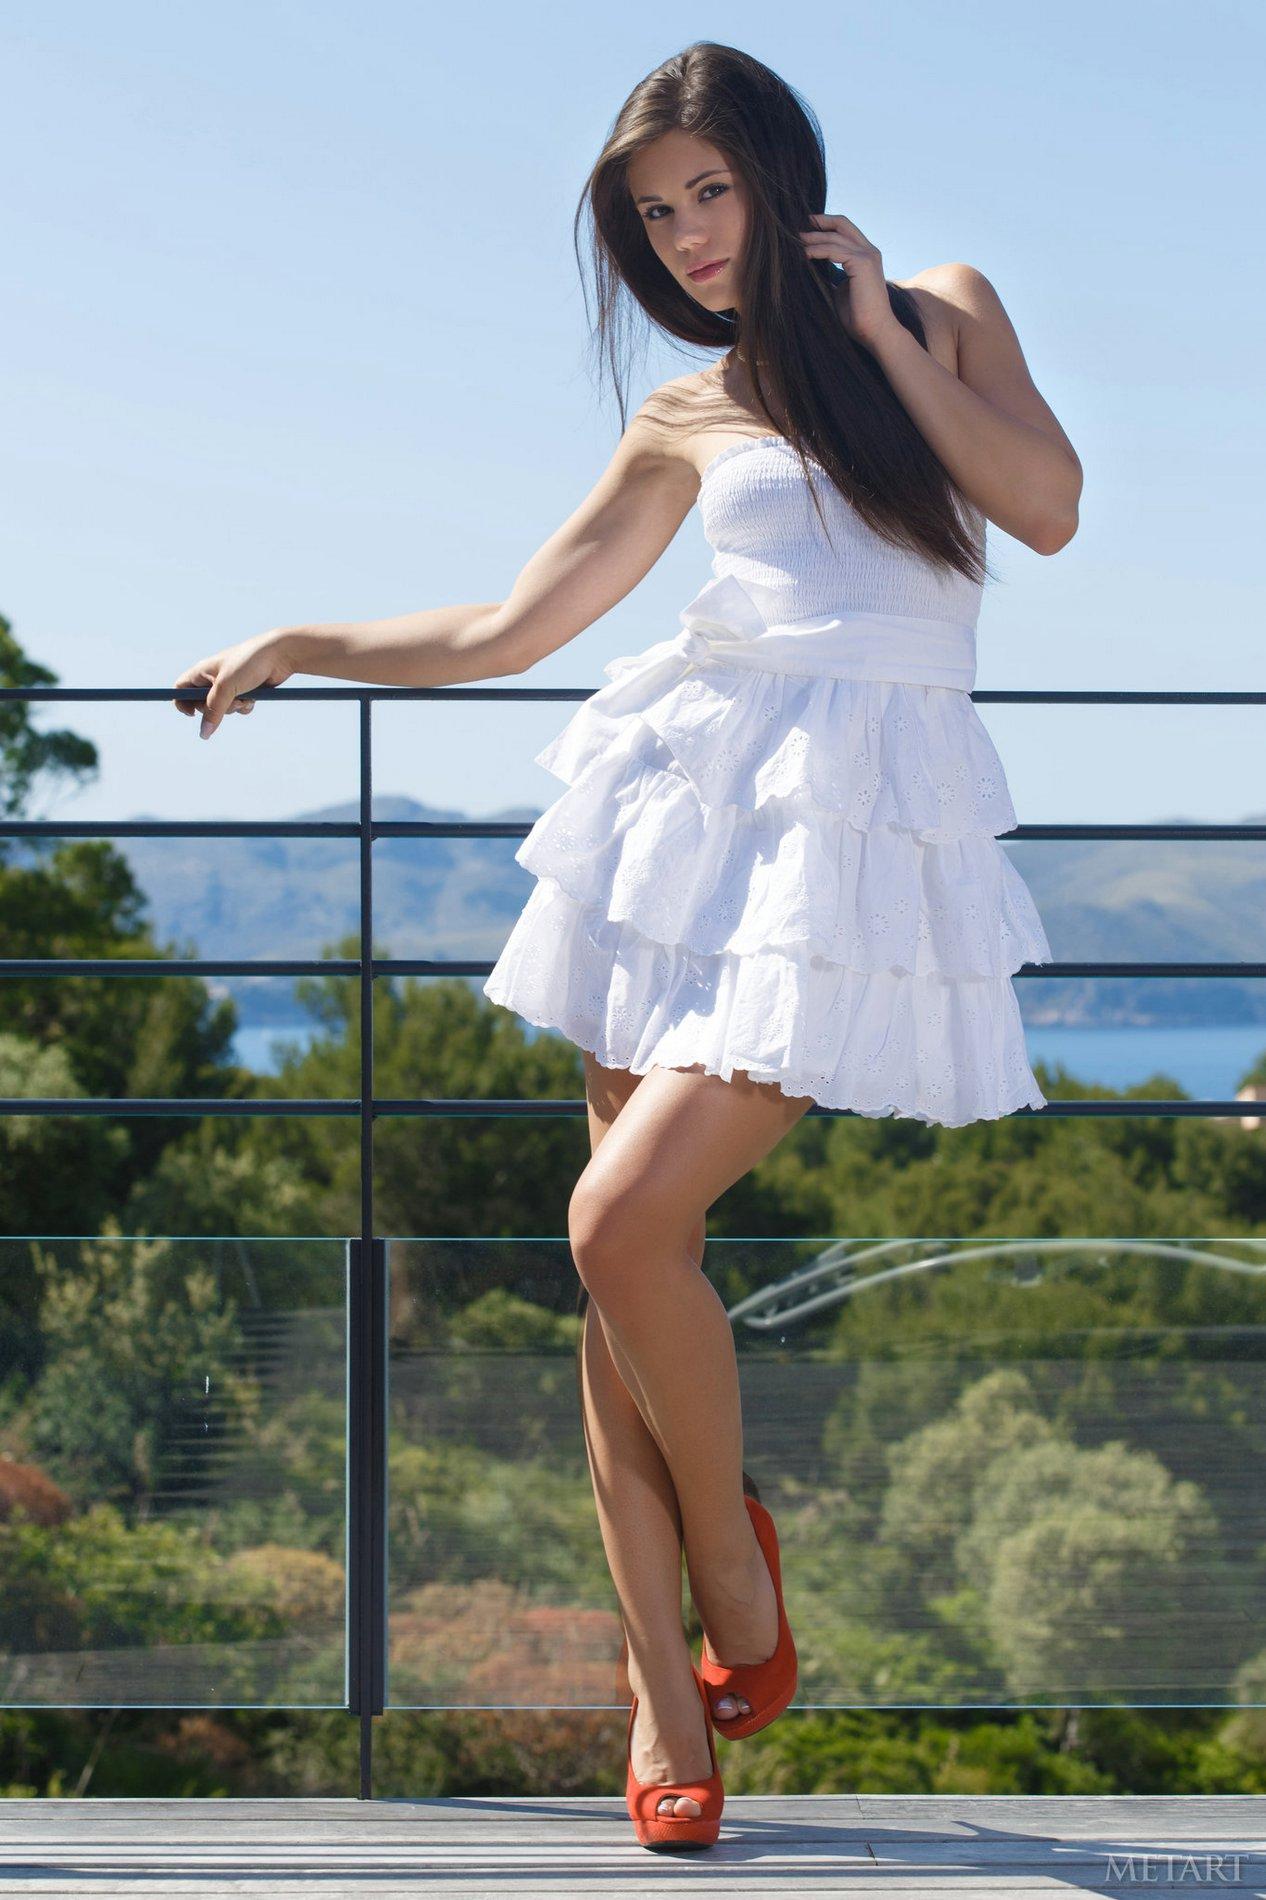 Dildo double penetration heels